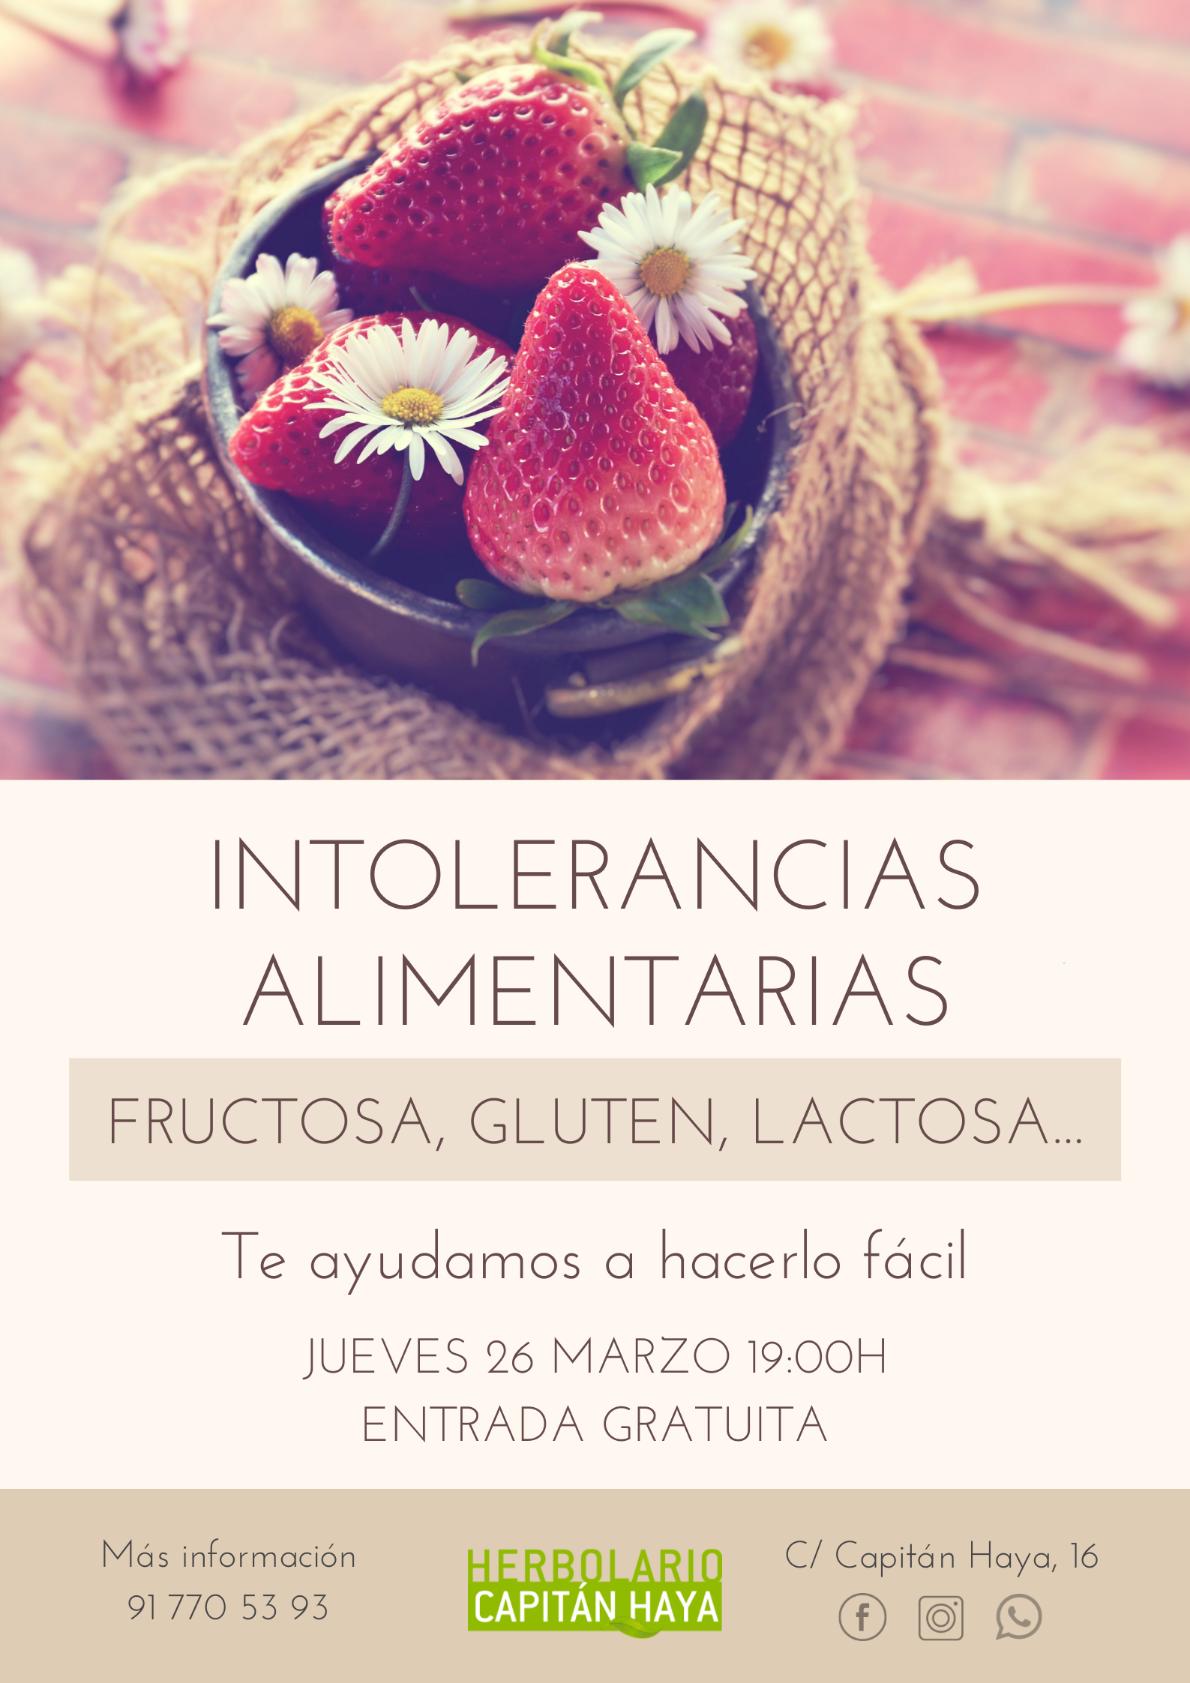 INTOLERANCIAS ALIMENTARIAS FRUCTOSA, GLUTEN, LACTOSA